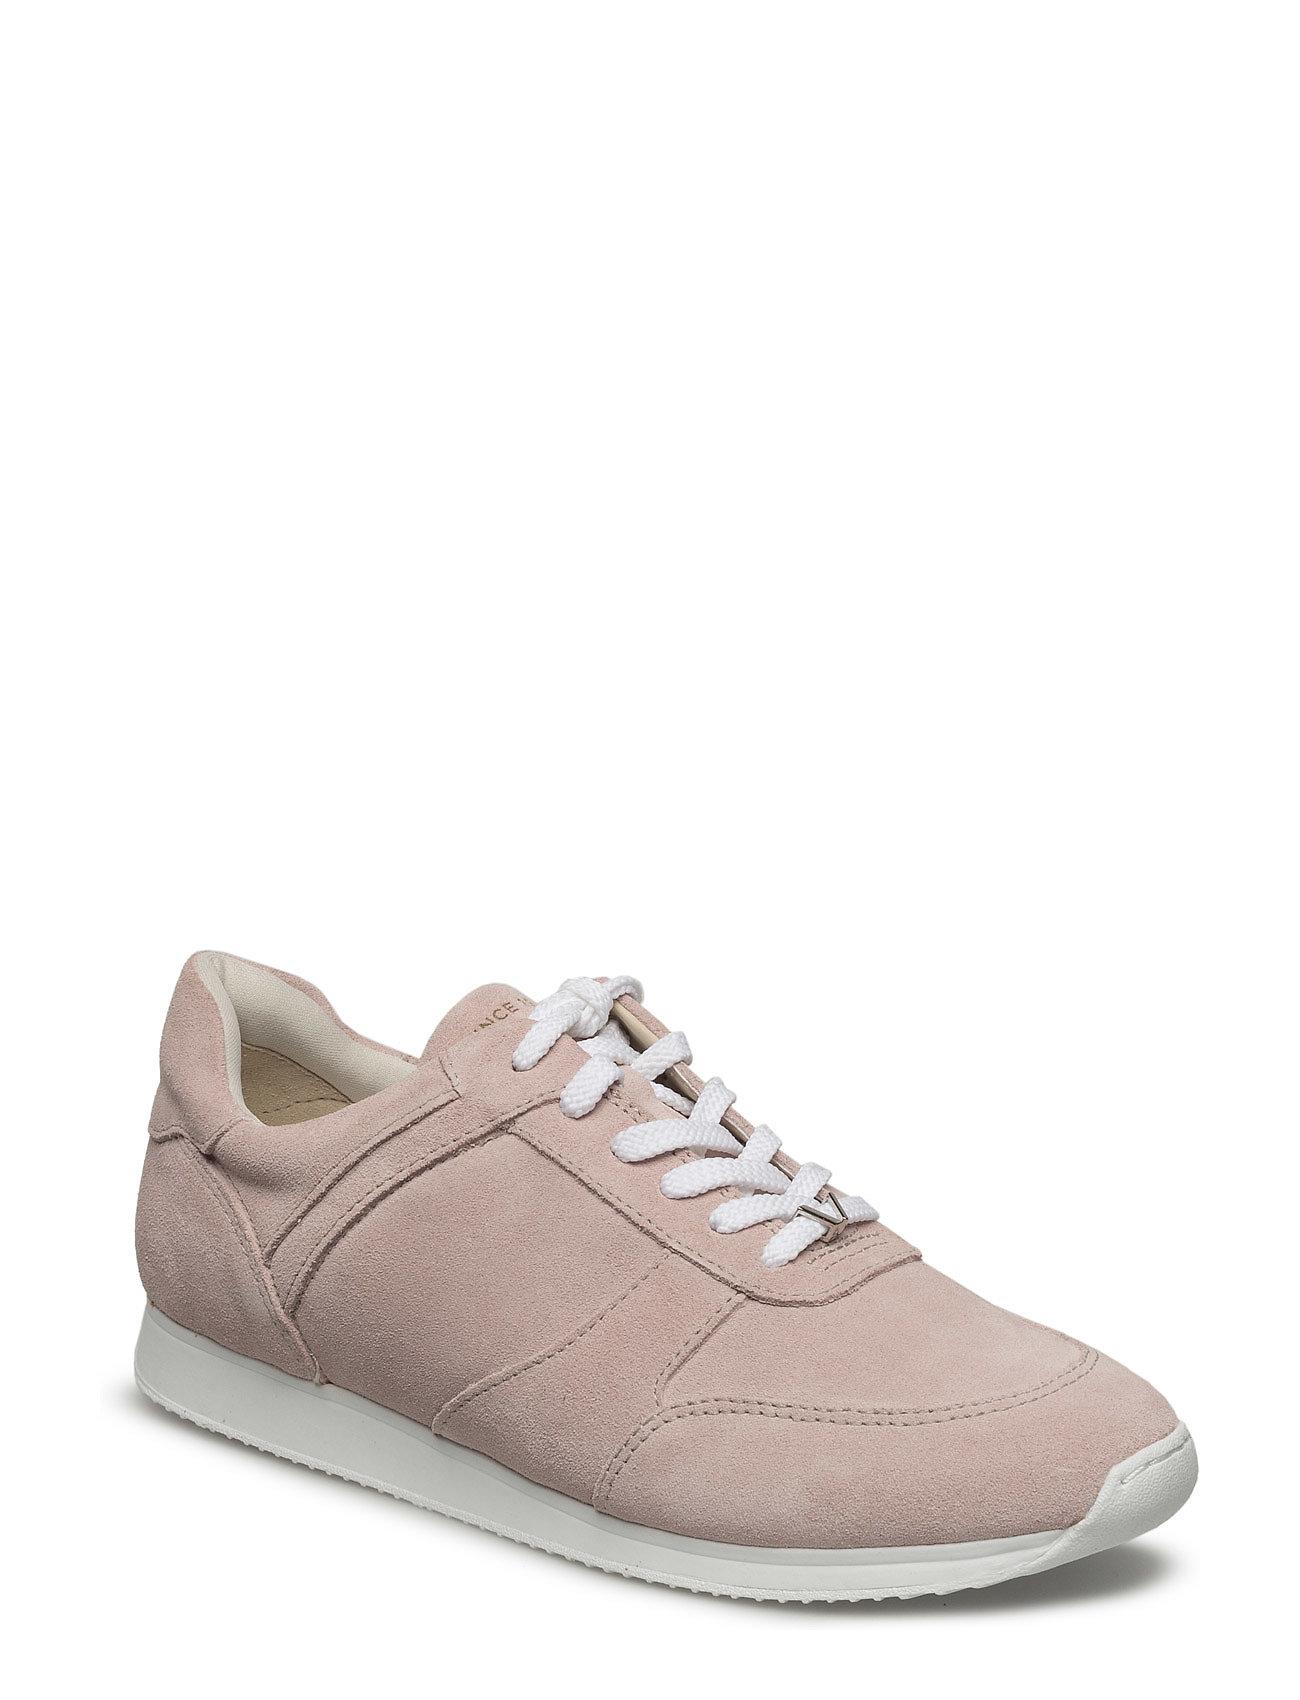 Kasai VAGABOND Sneakers til Damer i